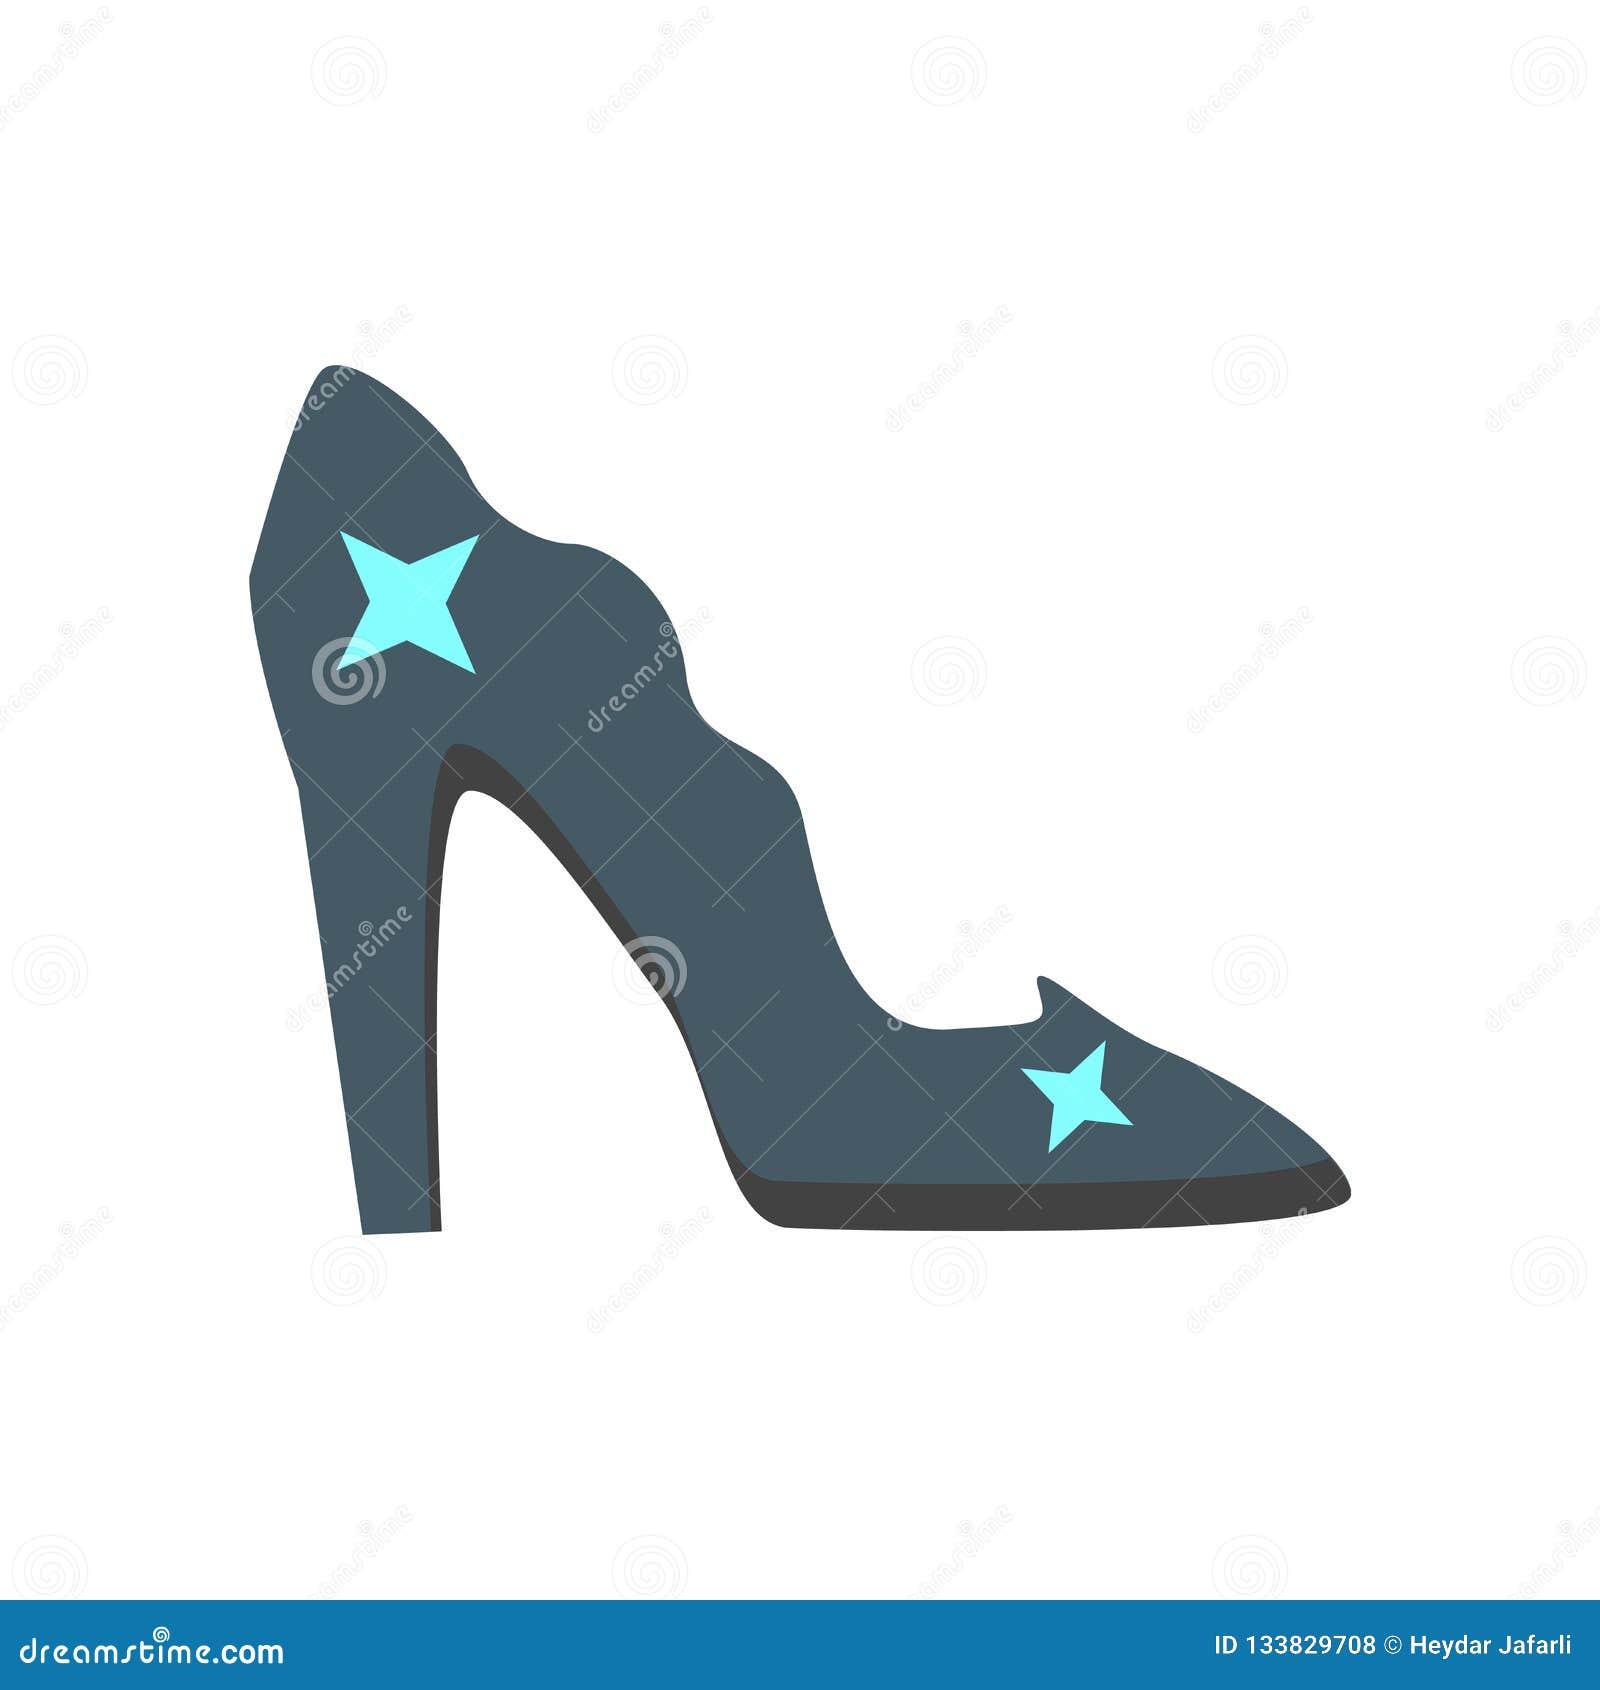 Cinderella Dresses Stock Vector Illustration Of Isolated: Cinderella Shoe Icon Vector Isolated On White Background